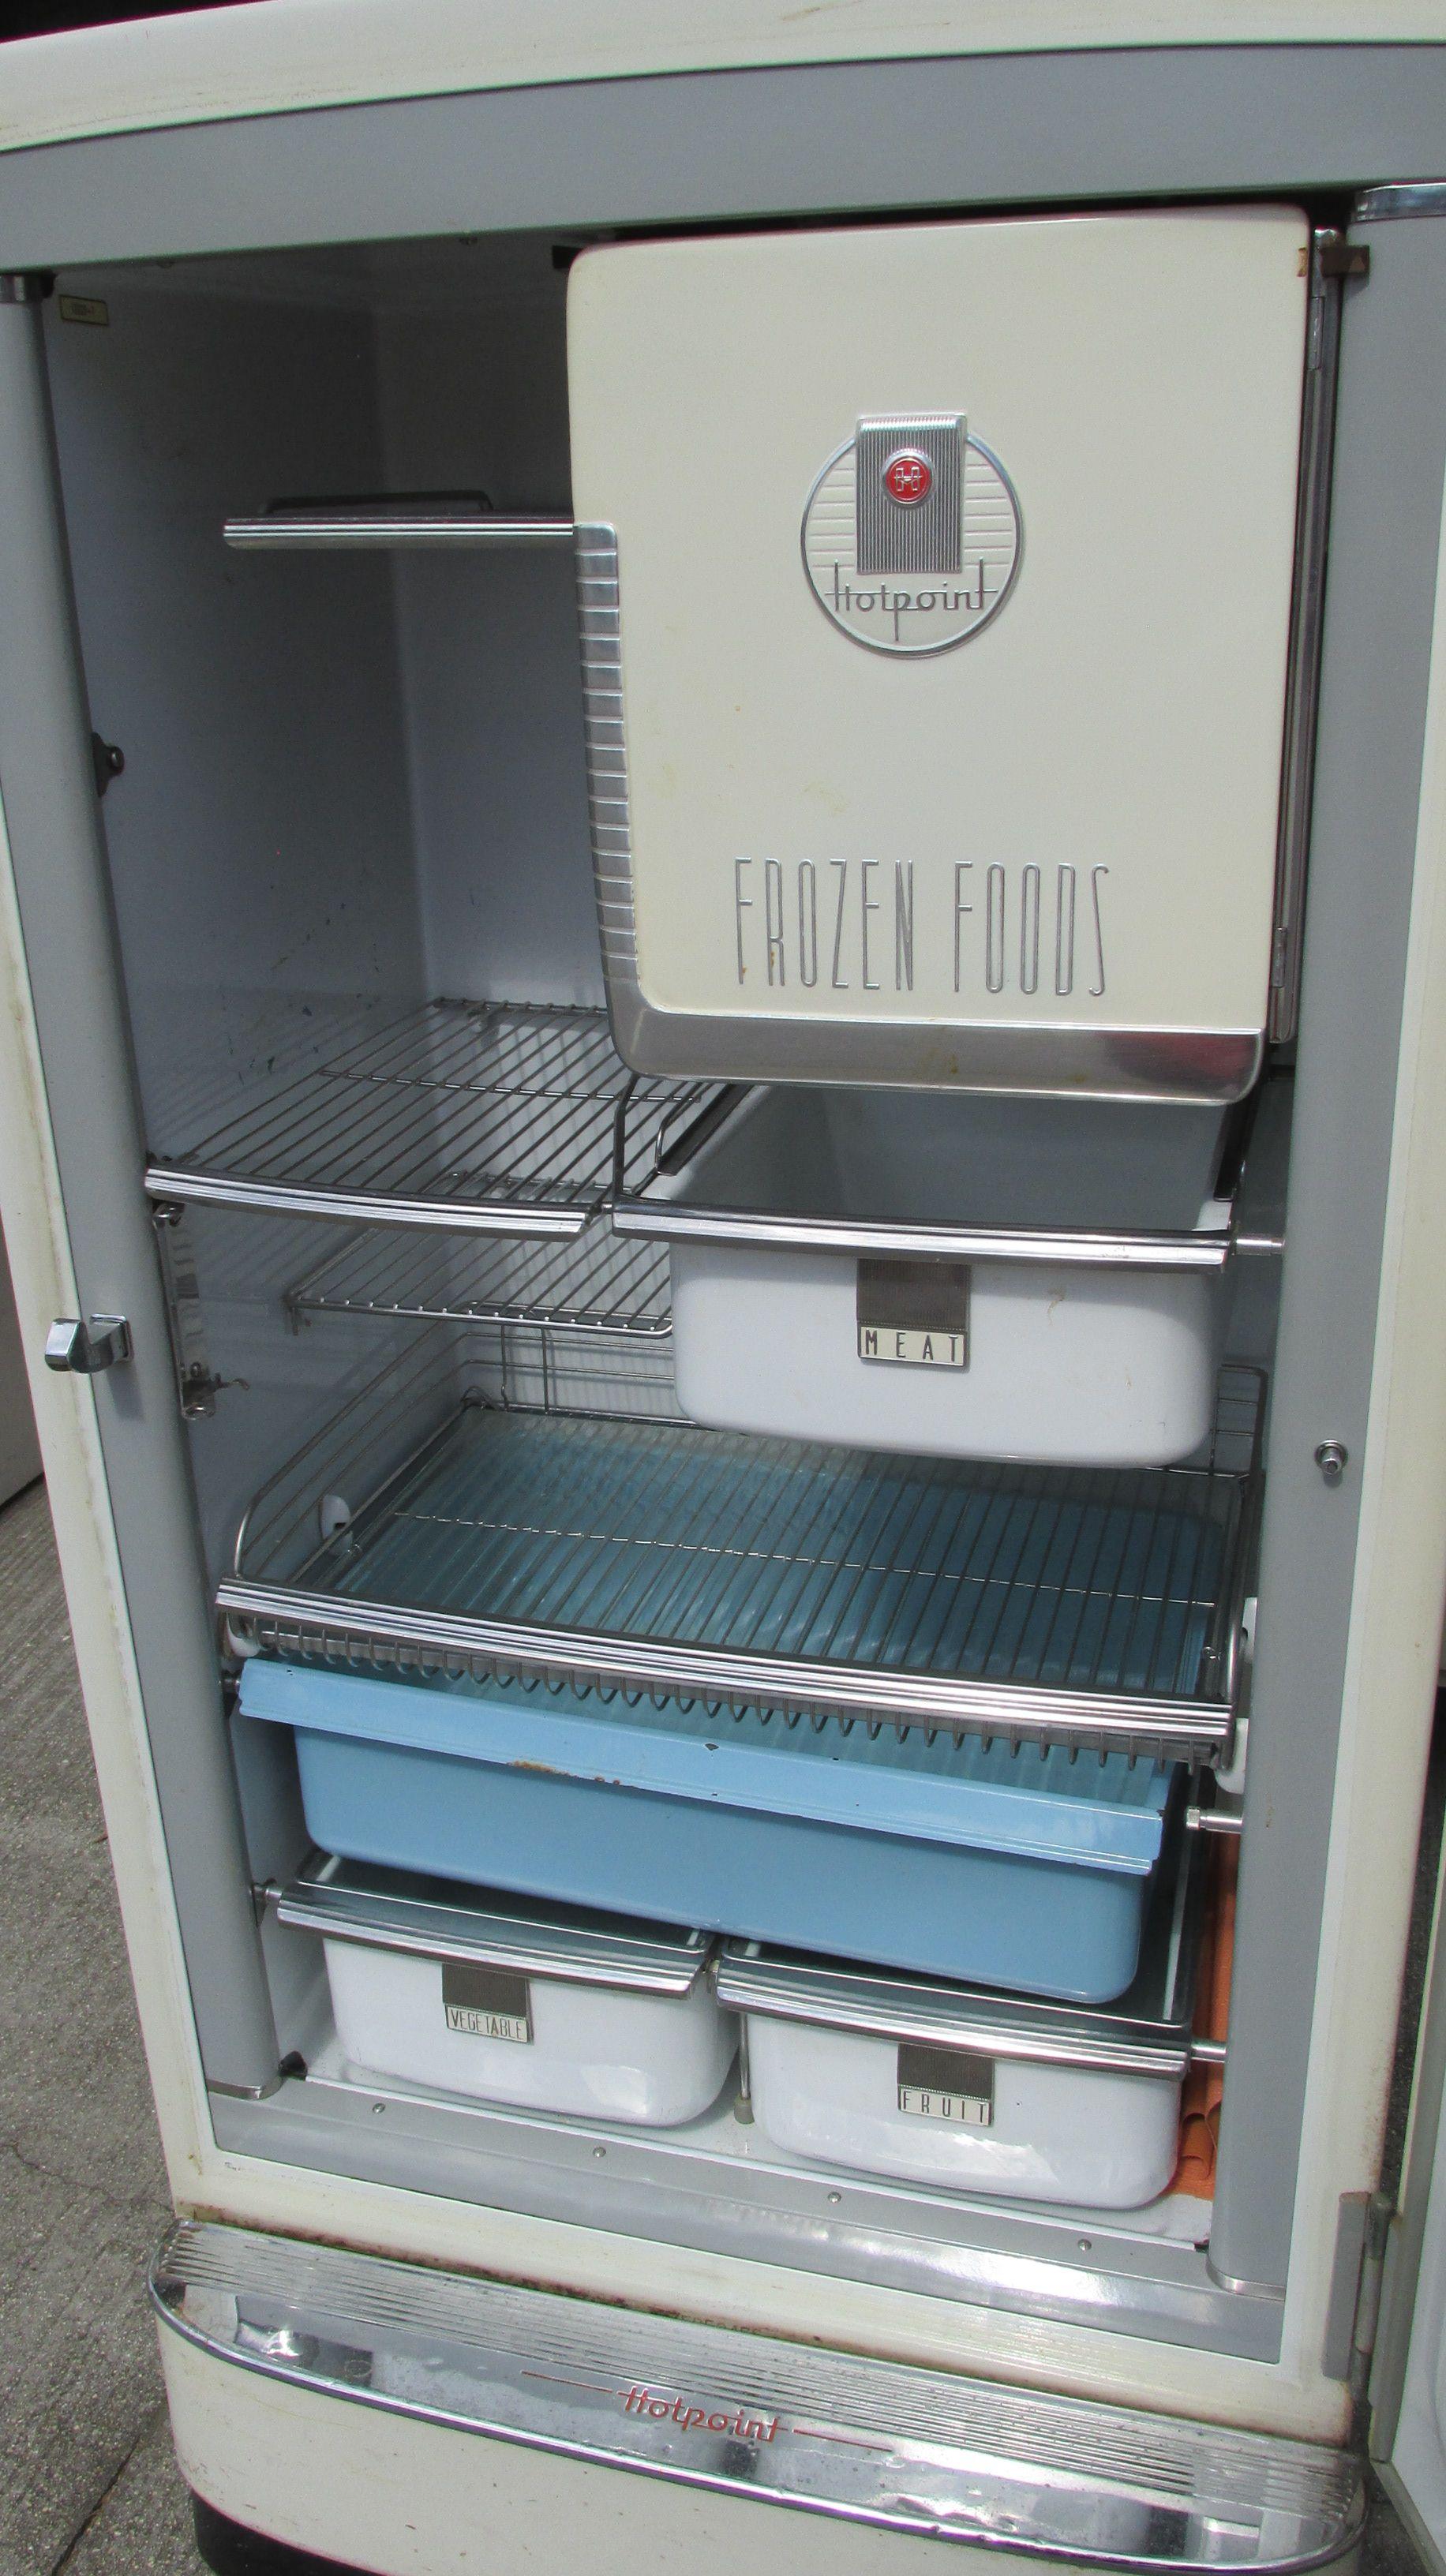 Unrestored Antique Refrigerators Vintage Refrigerator Vintage Fridge Retro Refrigerator